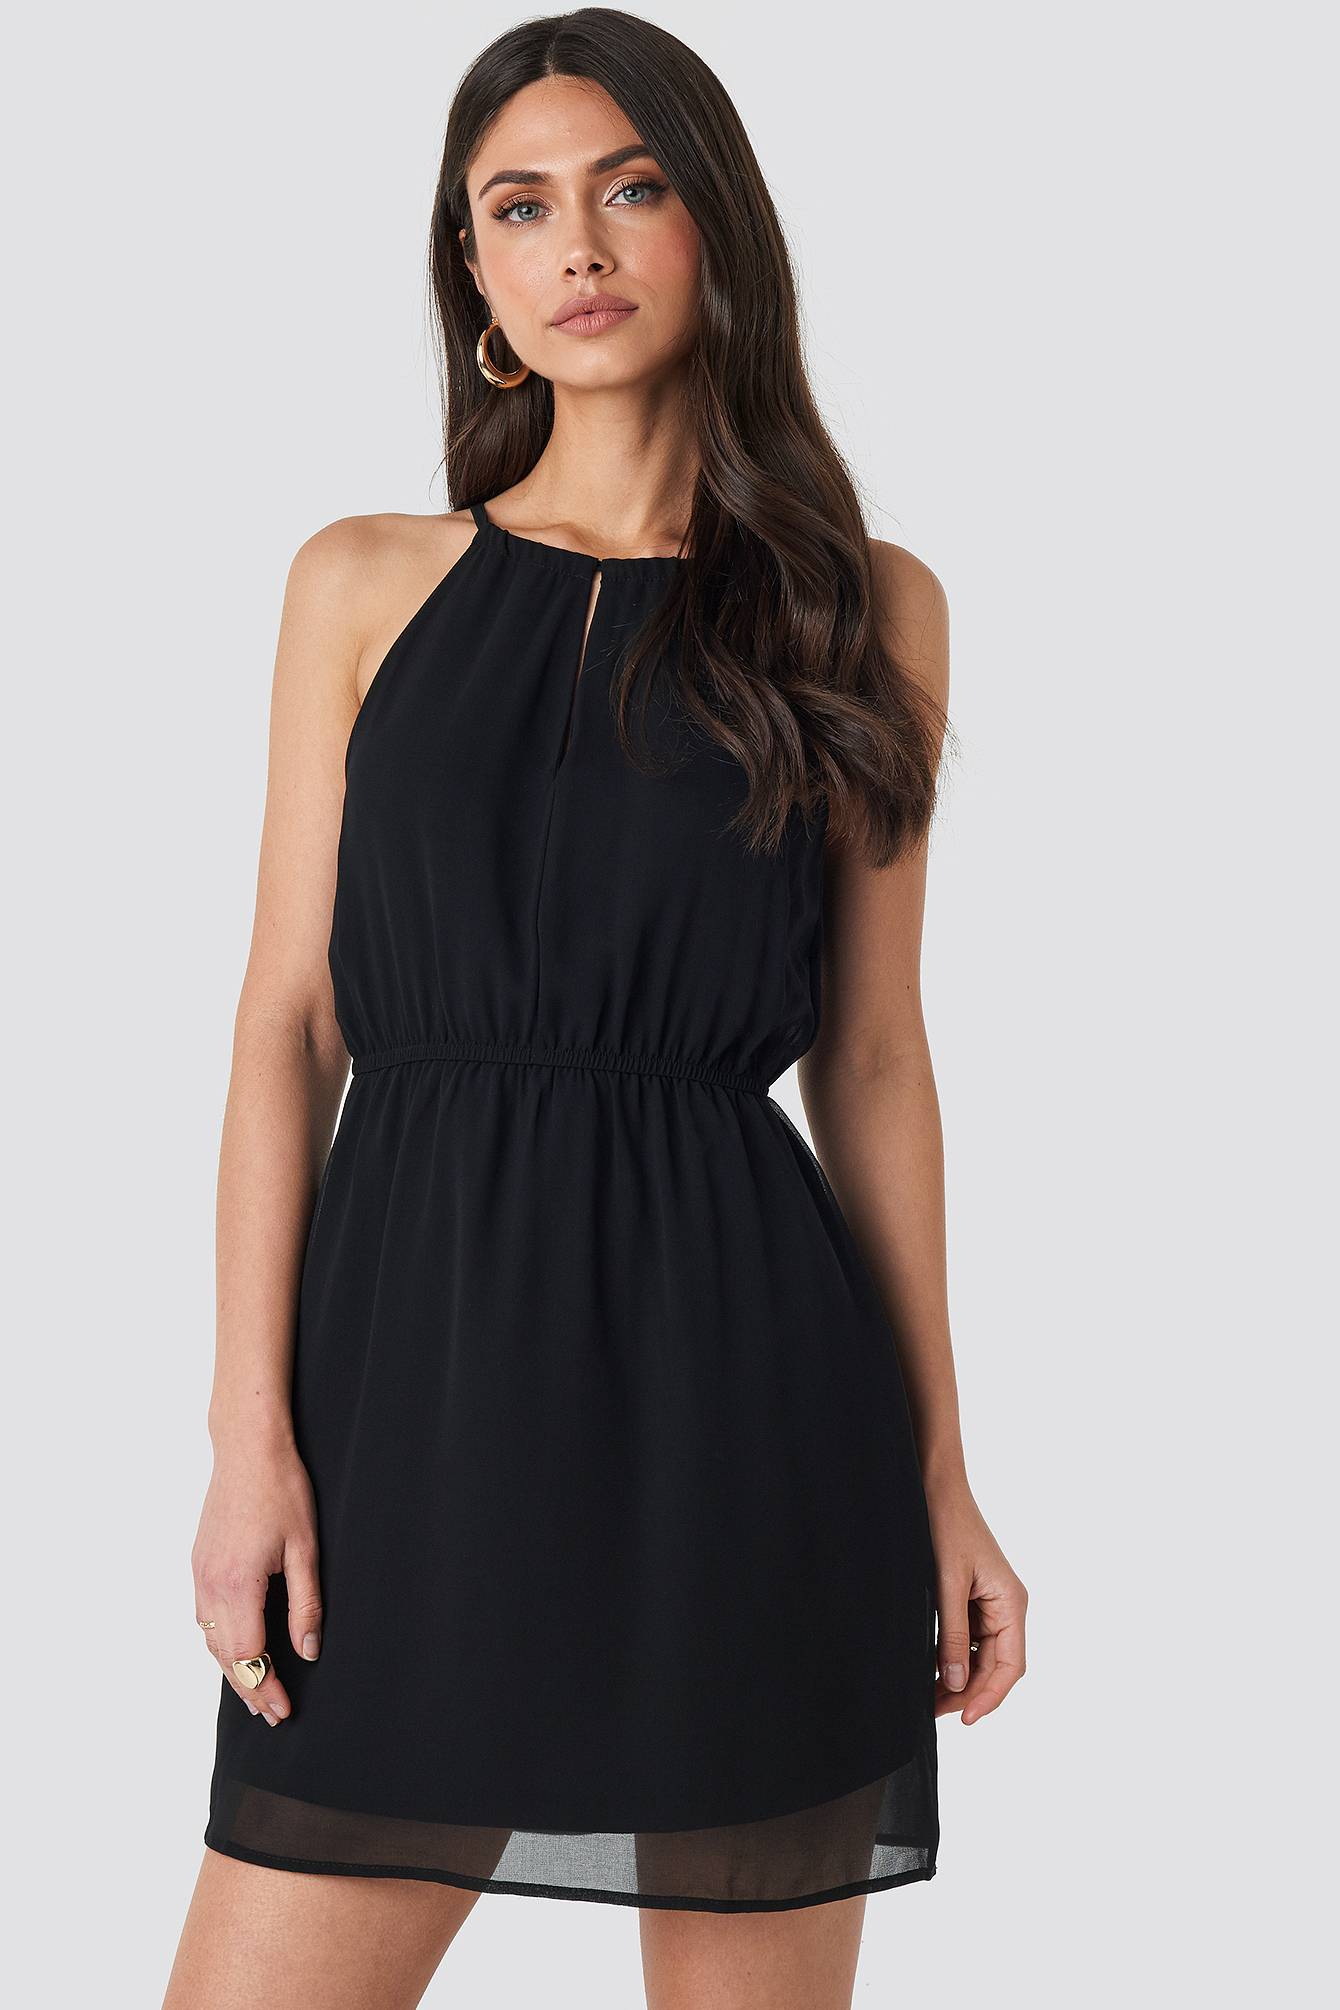 Image of NA-KD Party Halterneck Chiffon Mini Dress - Black